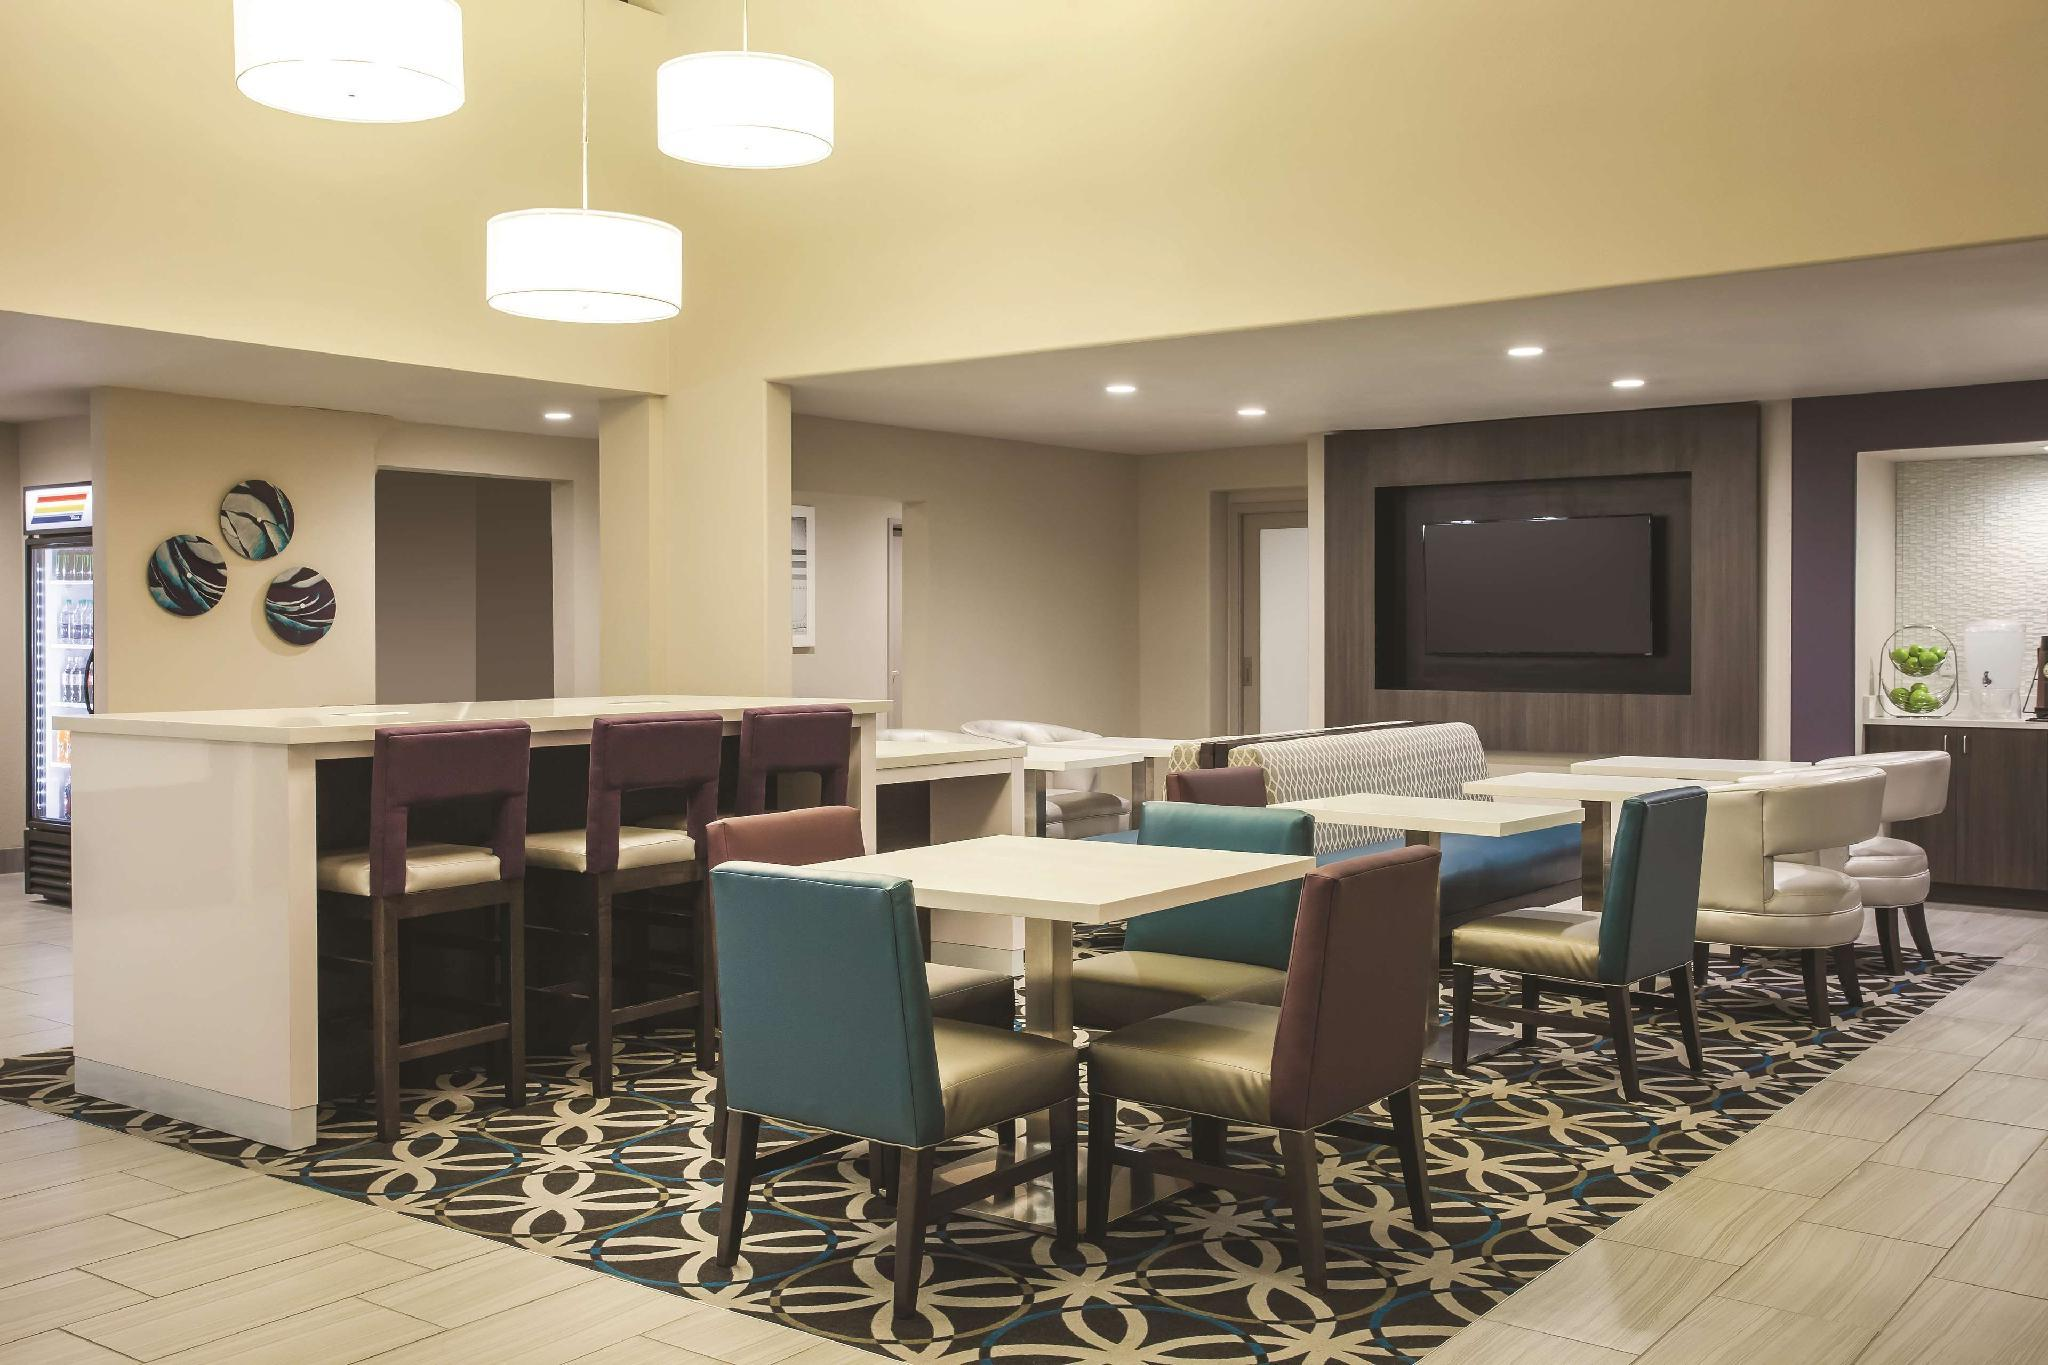 La Quinta Inn By Wyndham Las Vegas Nellis